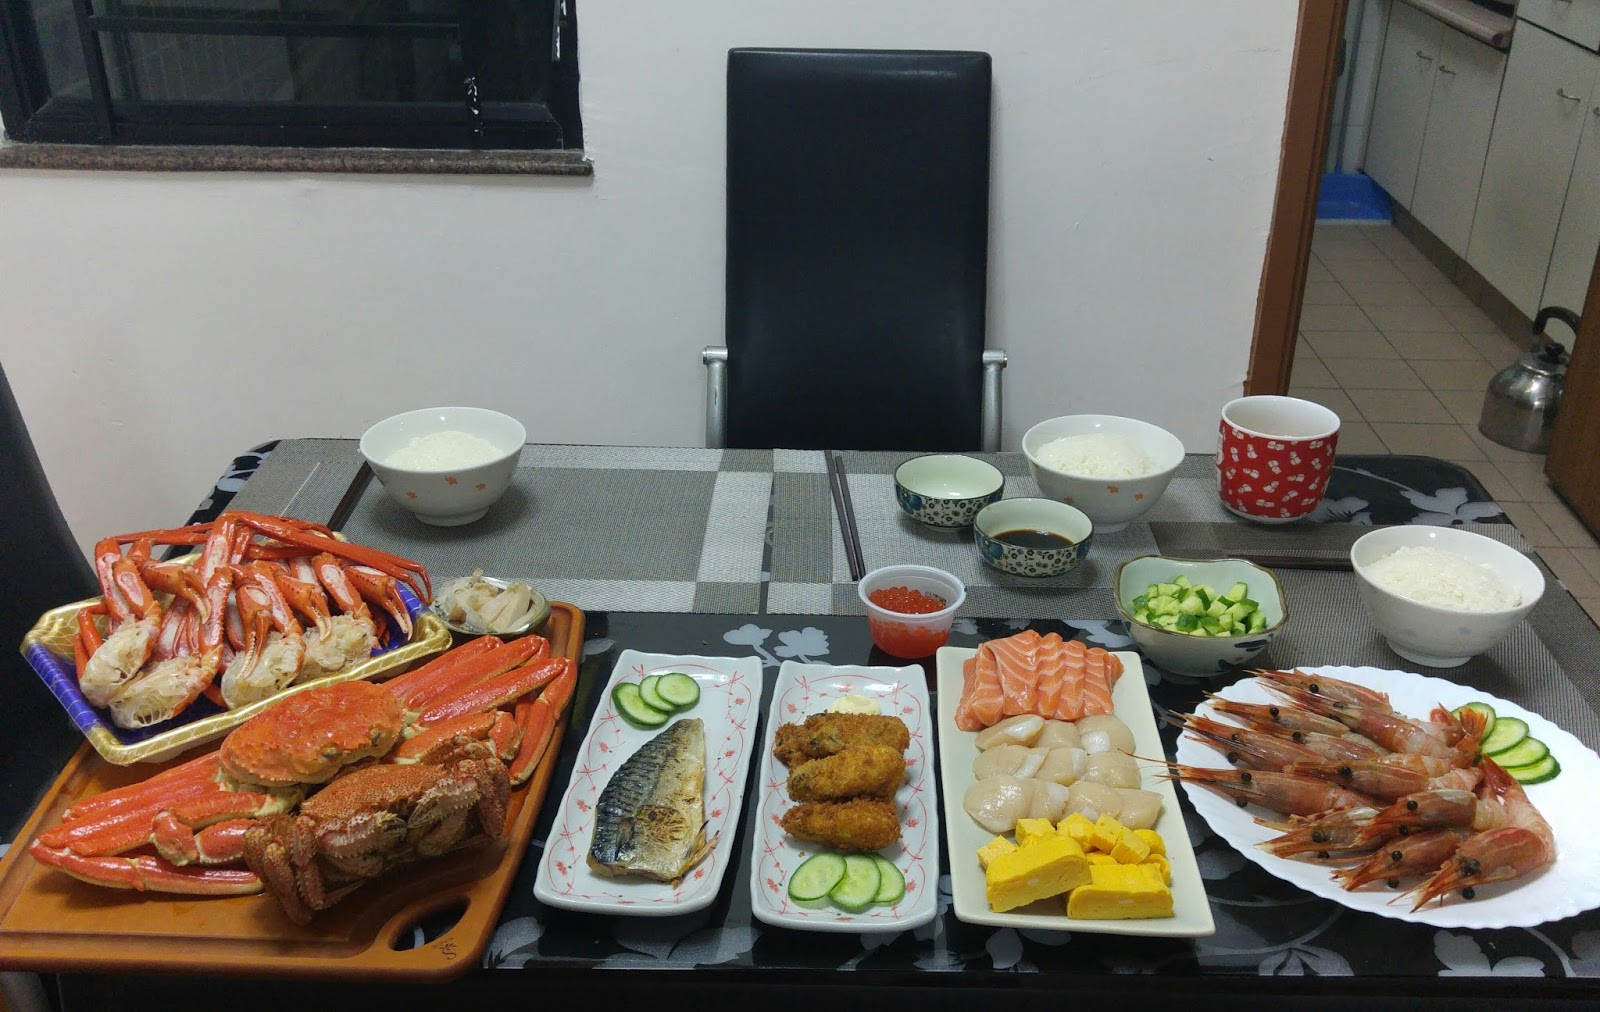 Owenmama's Kitchen: 日式玉子焼(甜蛋壽司) + 壽司醋飯 (附食譜 )